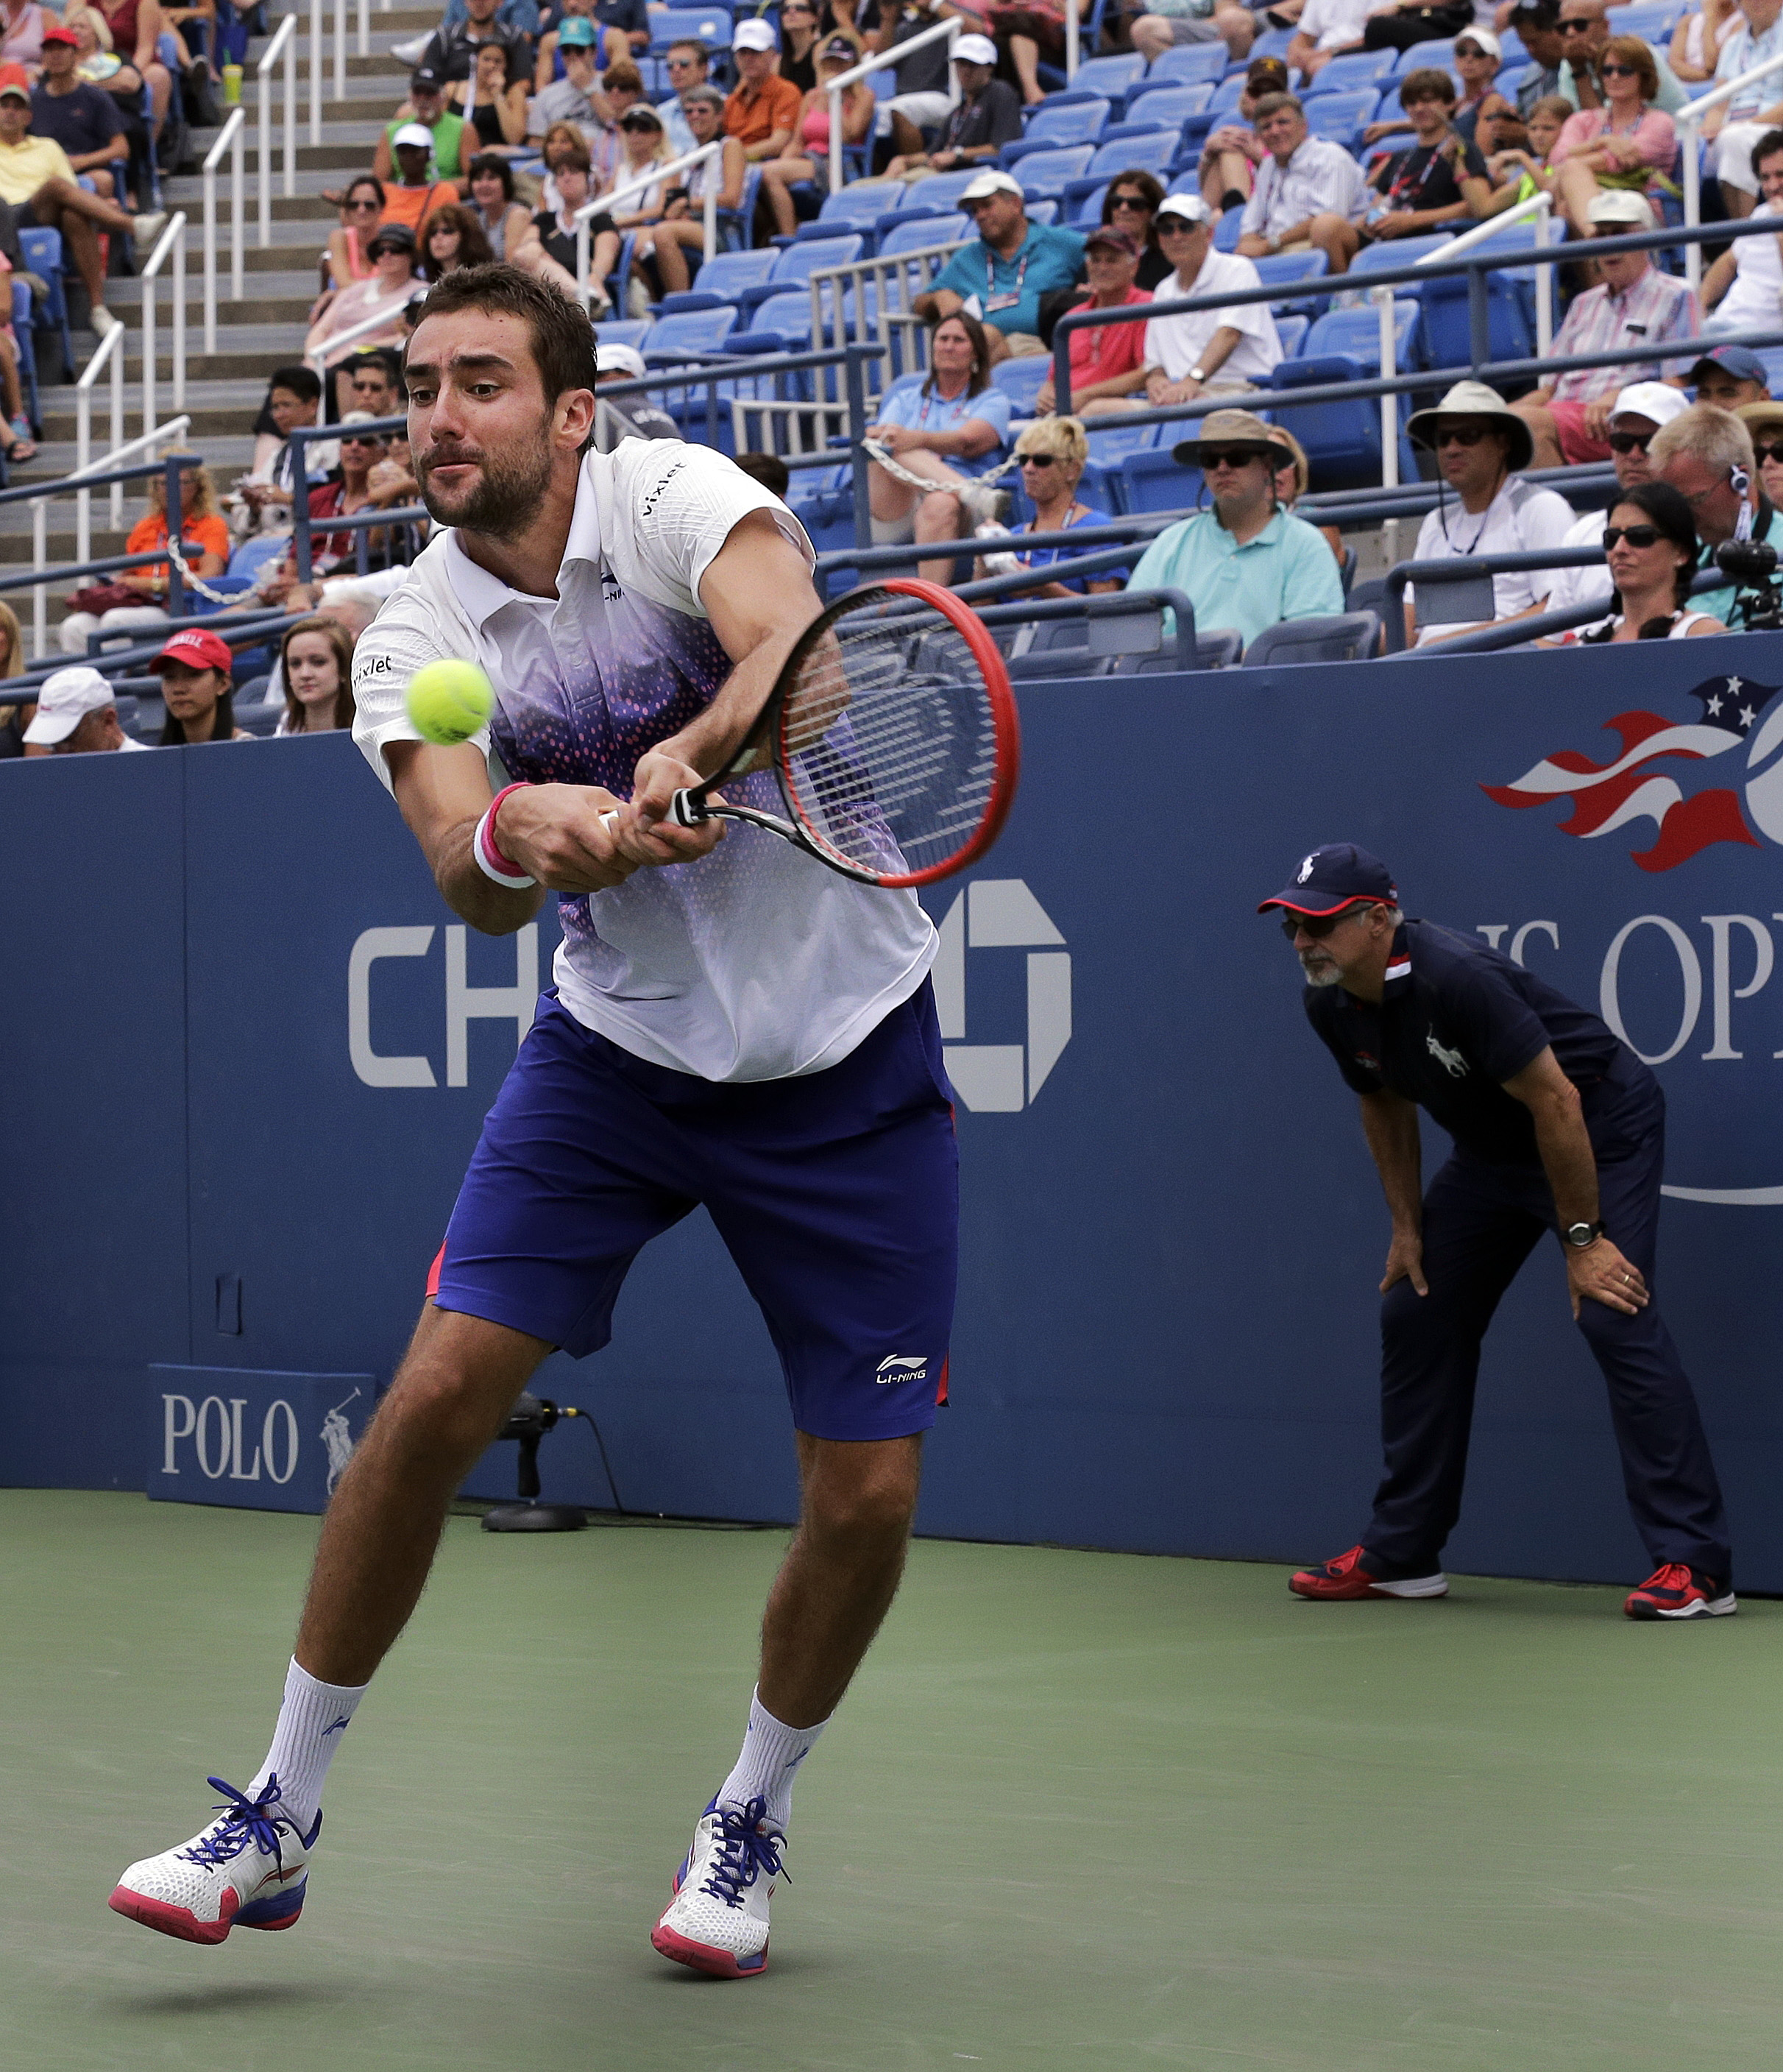 Marin Cilic, of Croatia, returns a shot to Mikhail Kukushkin, of Kazakhstan, during the third round of the U.S. Open tennis tournament, Friday, Sept. 4, 2015, in New York. (AP Photo/Charles Krupa)